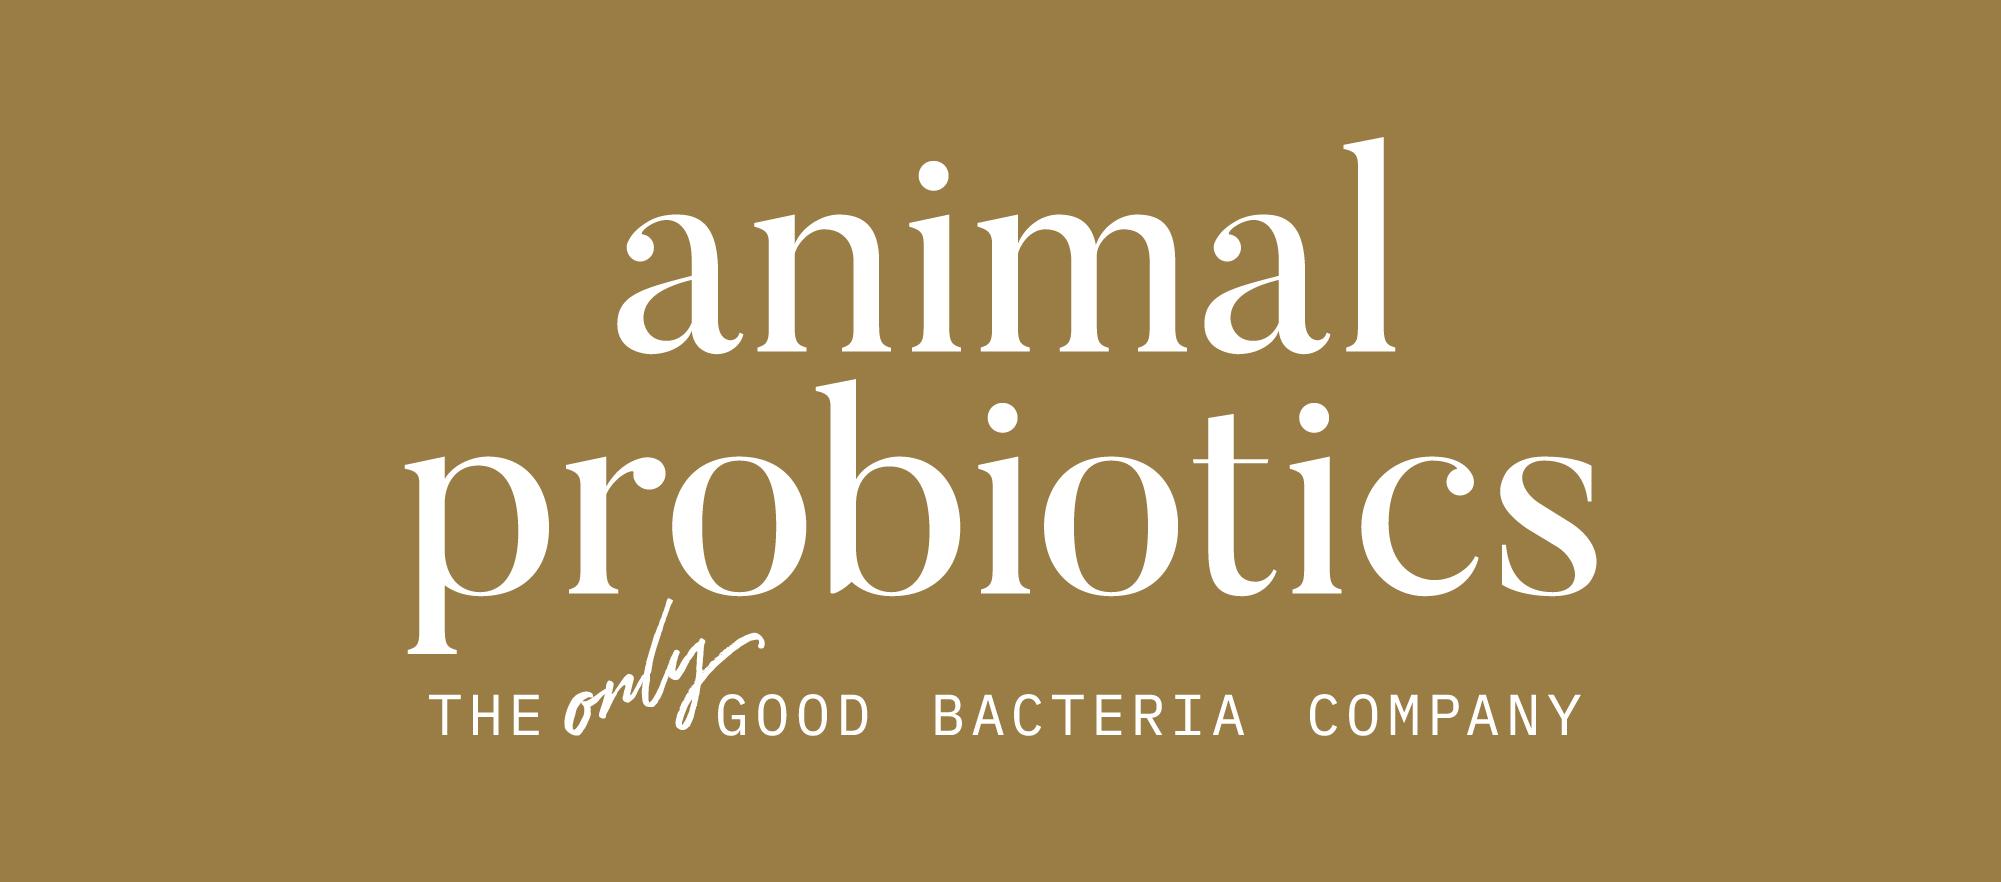 Animal probiotics